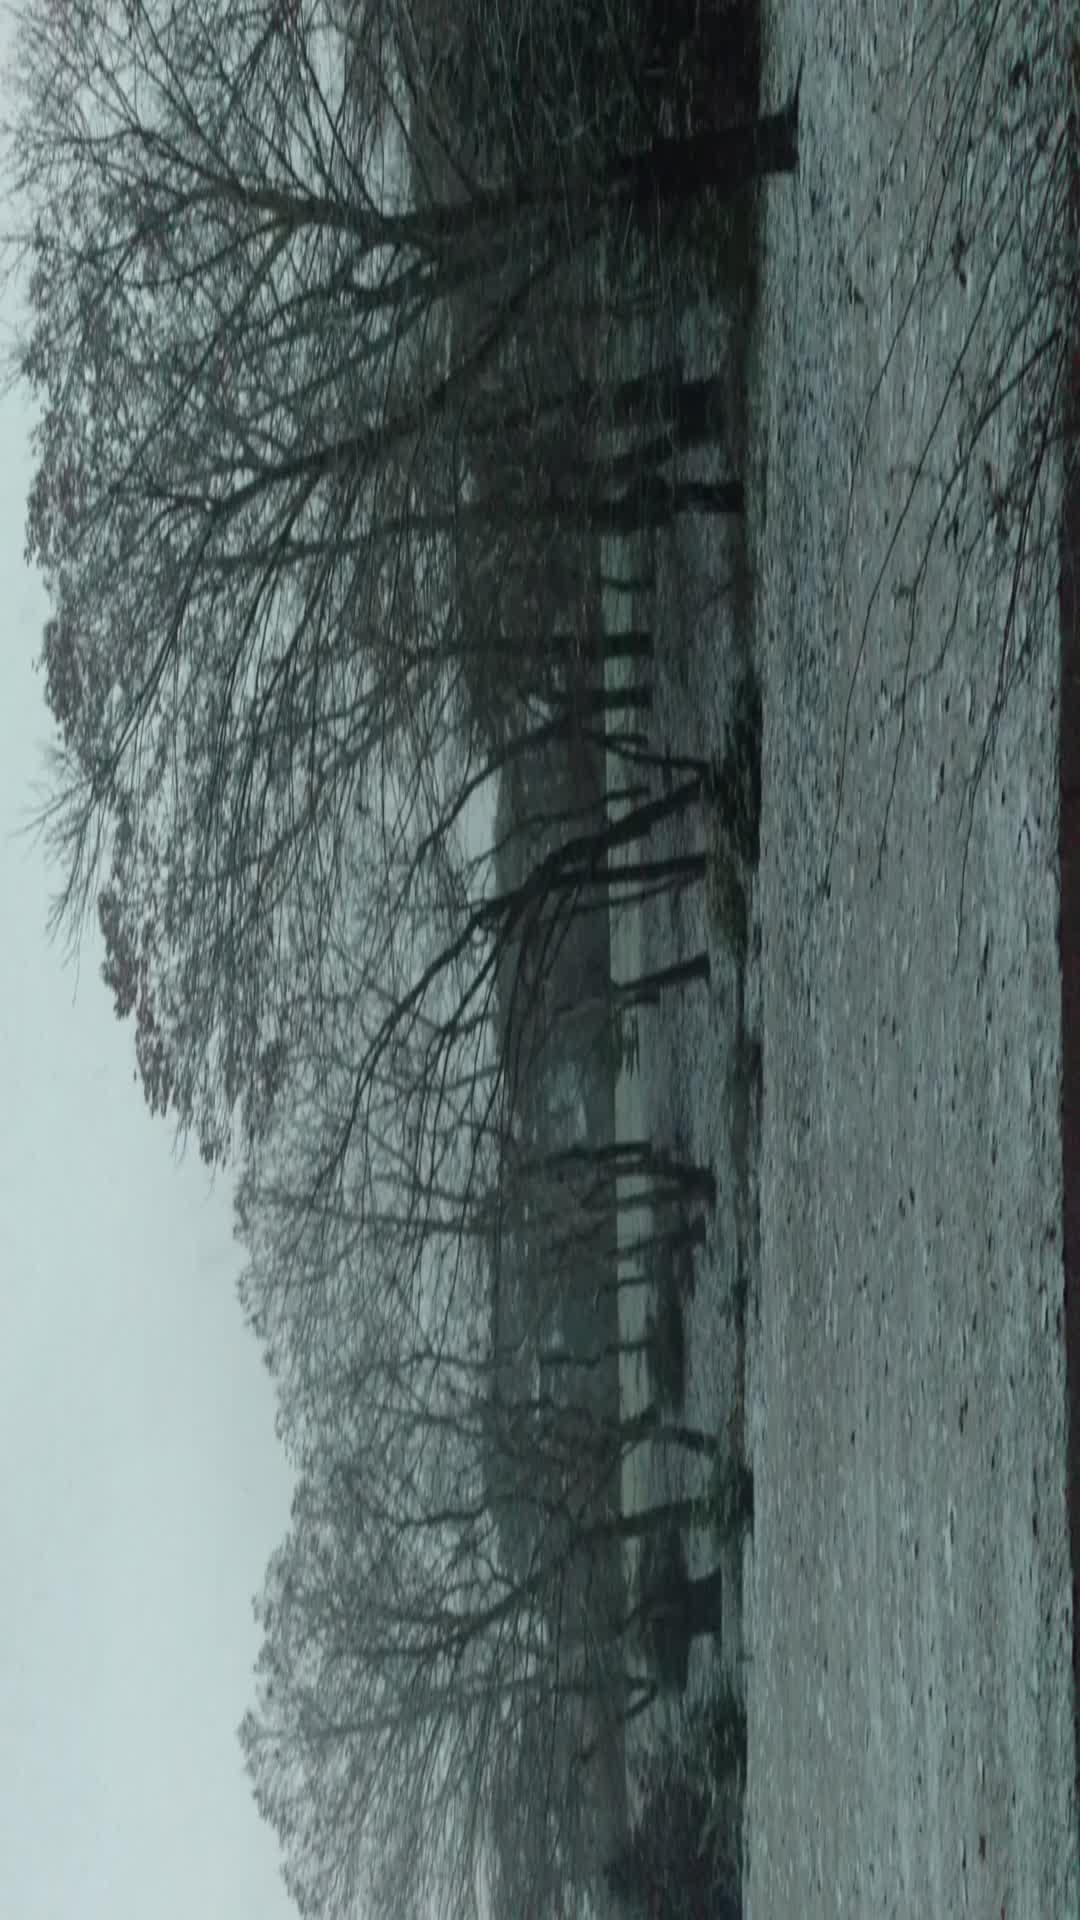 Snow in North Washington County